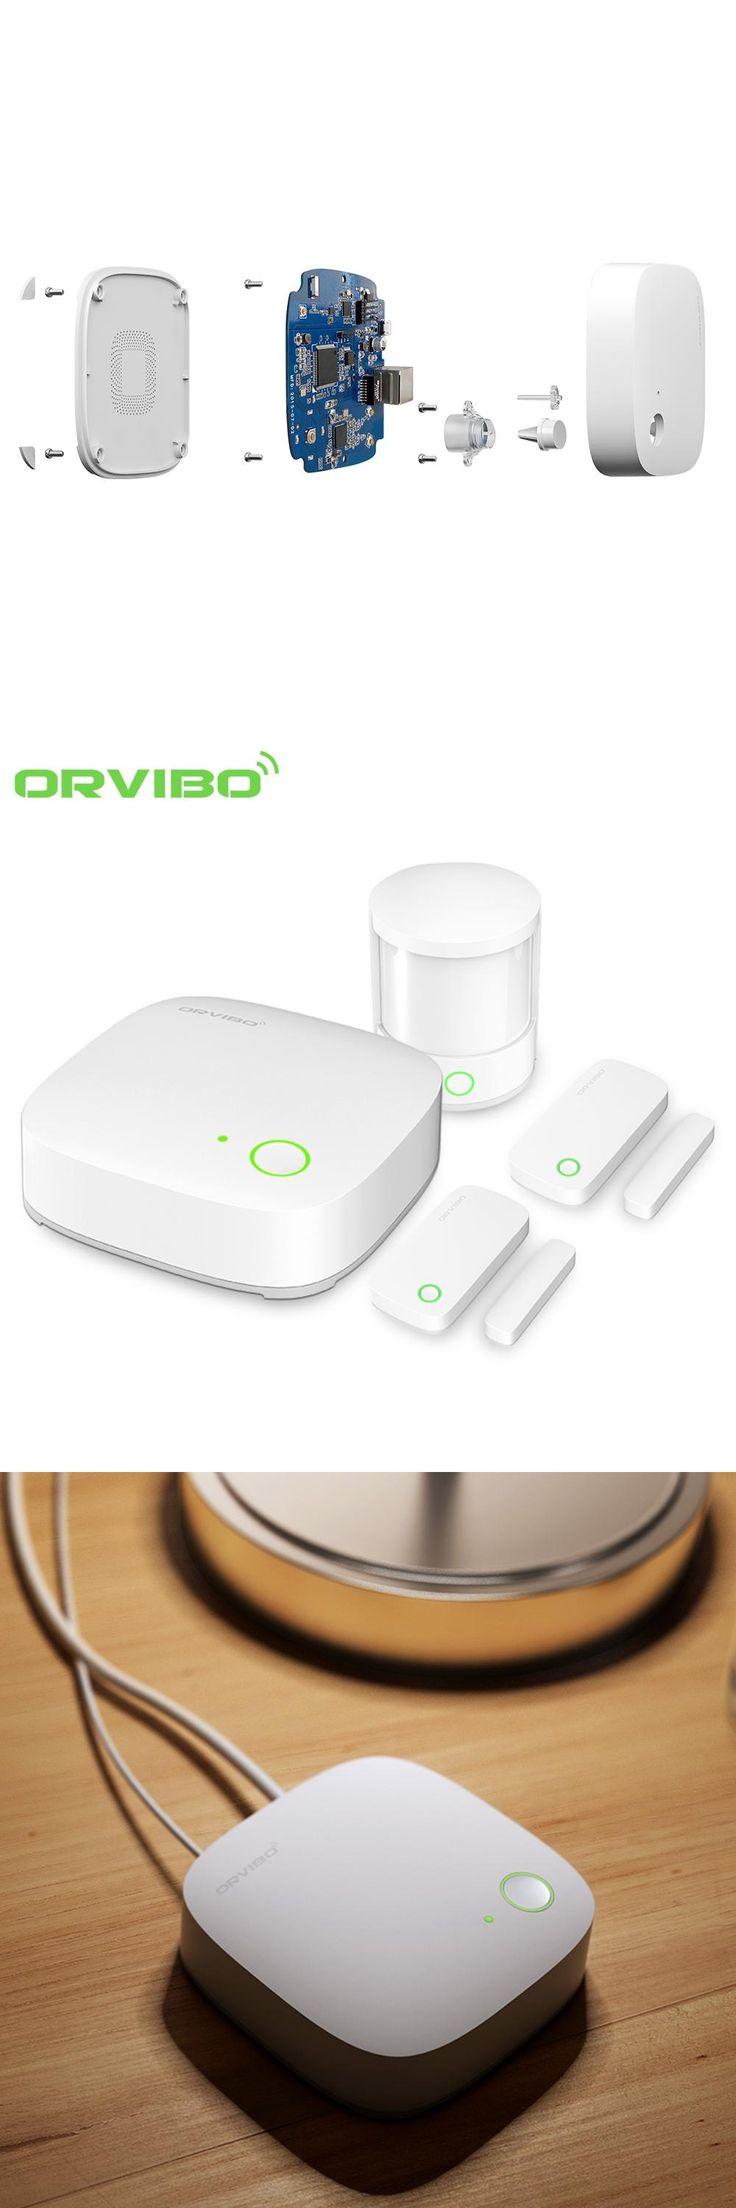 New Orvibo Smart Home Kit Zigbee Smart Home Automation Controller ZigBee Remote Mini Hub Switch WIFI Wireless Internet Control